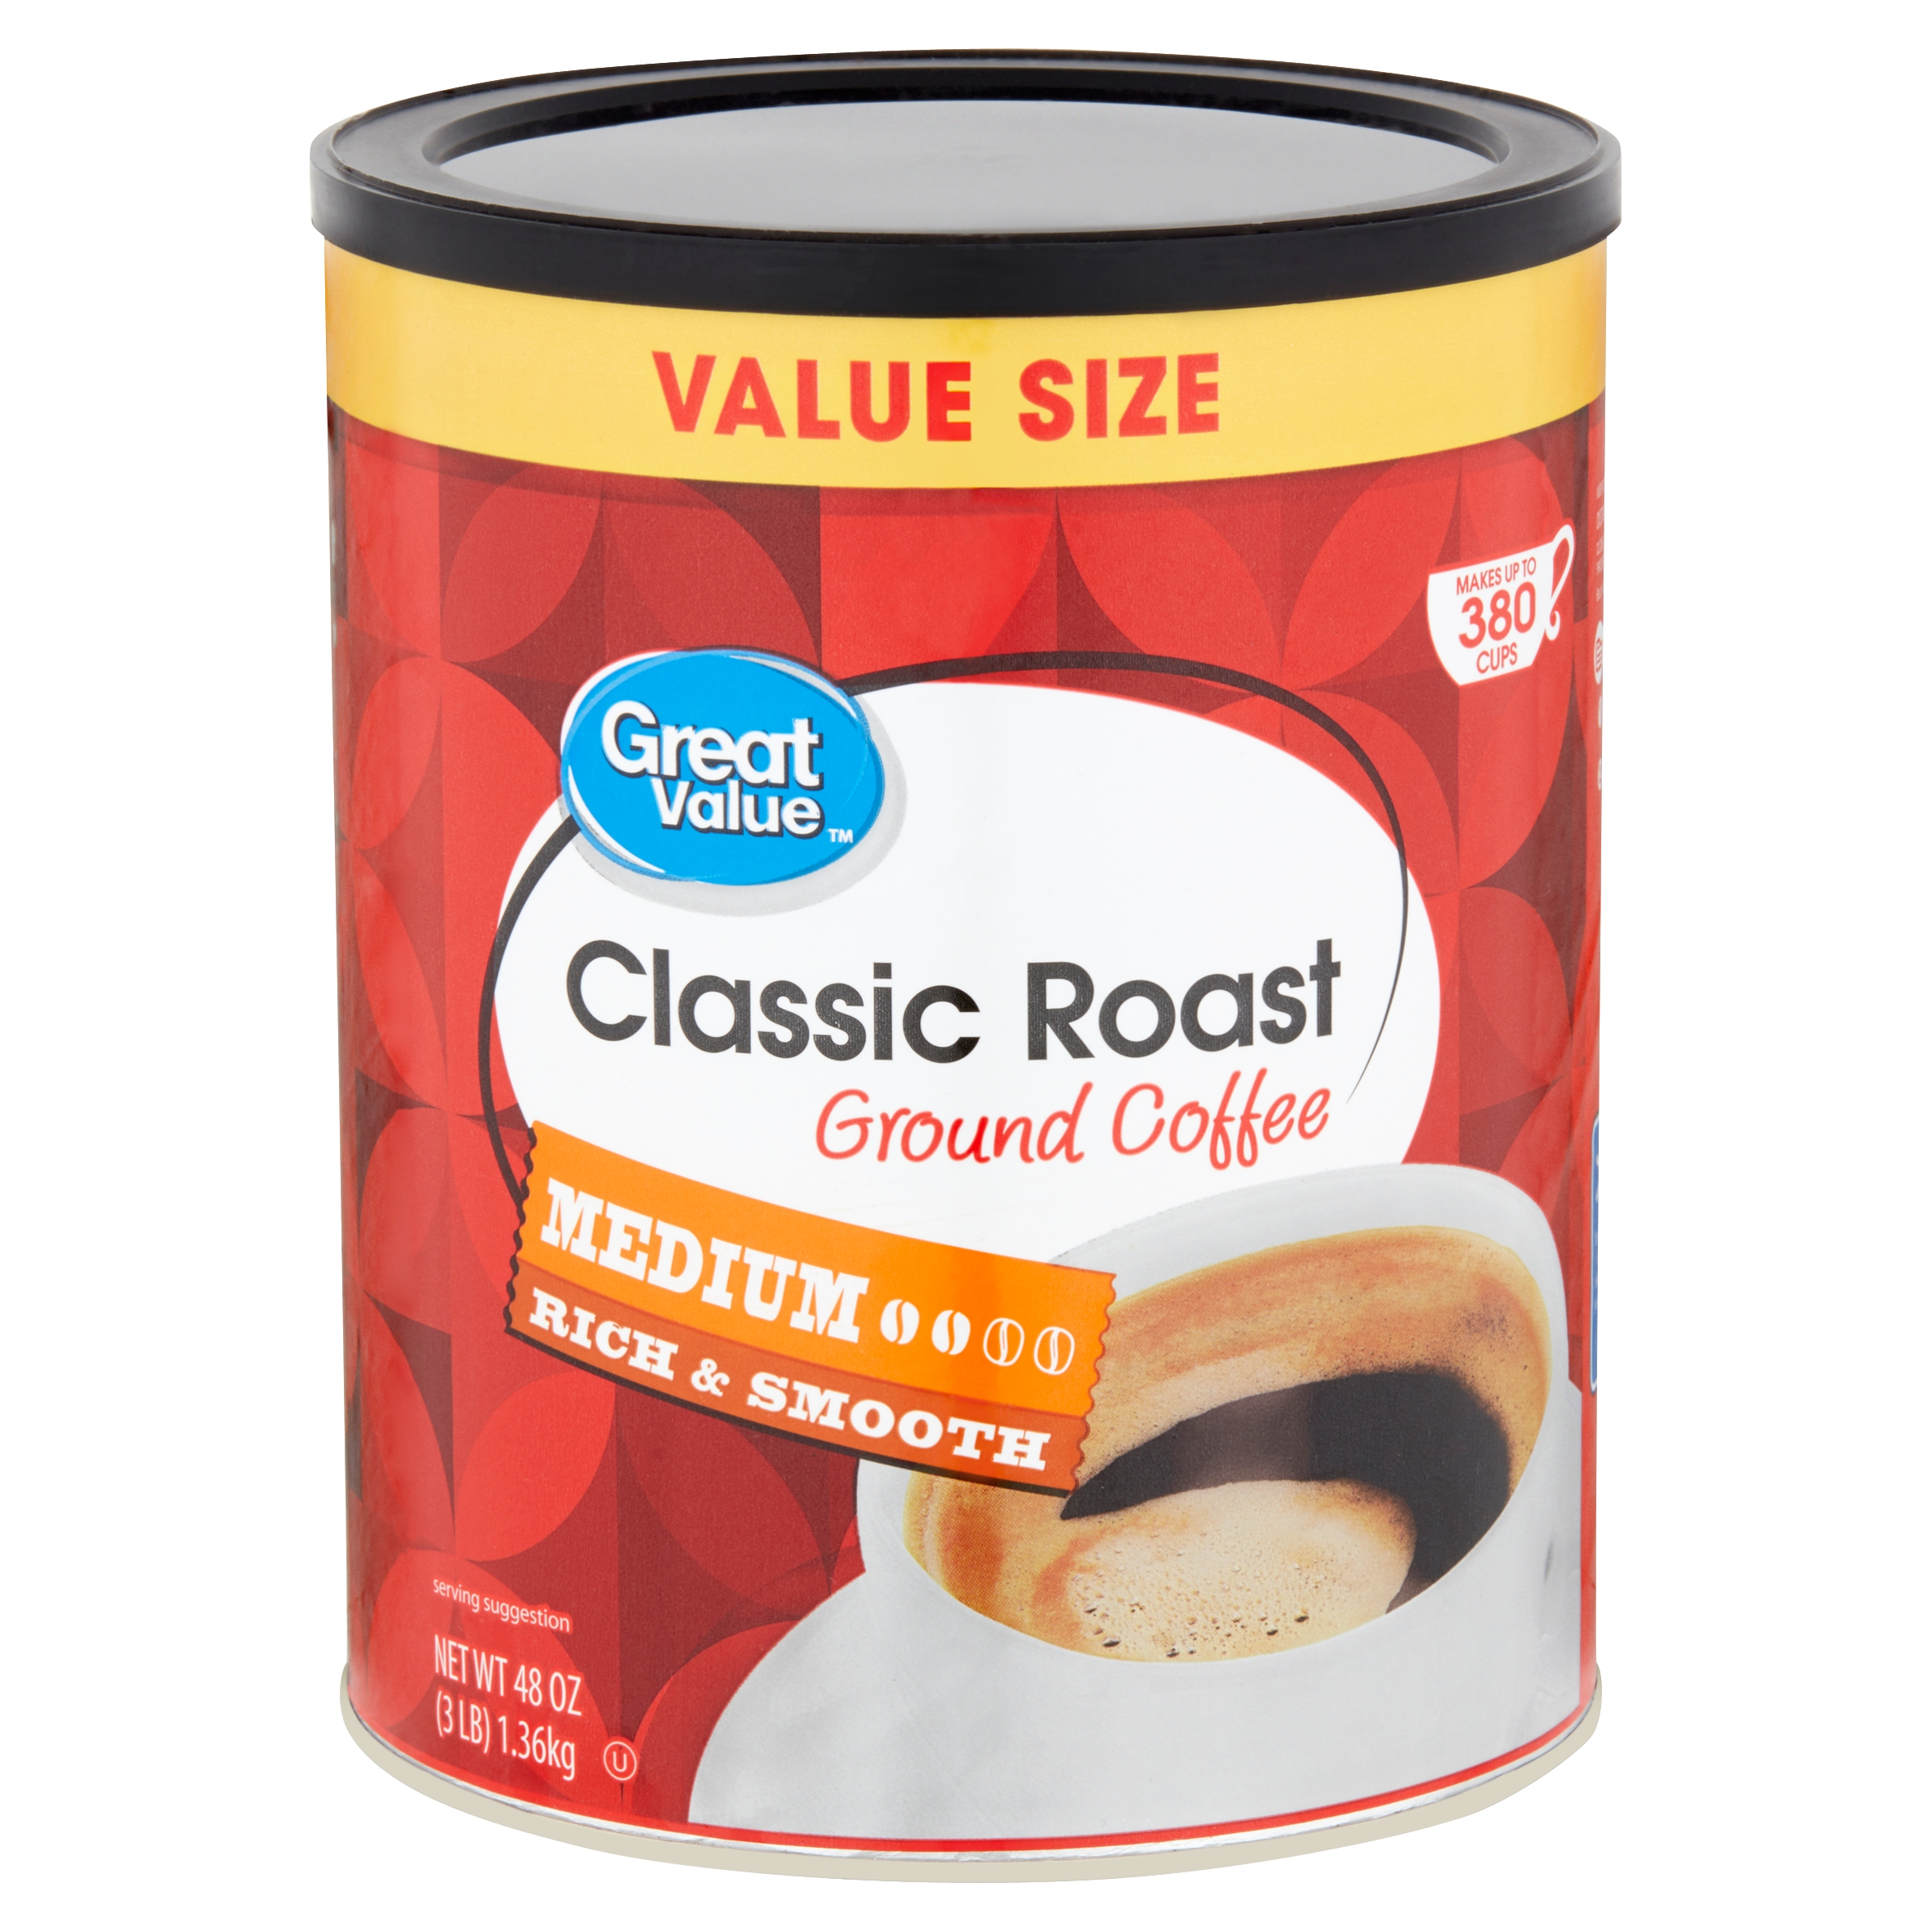 Great Value Classic Roast Medium Ground Coffee Value Size, 48 oz